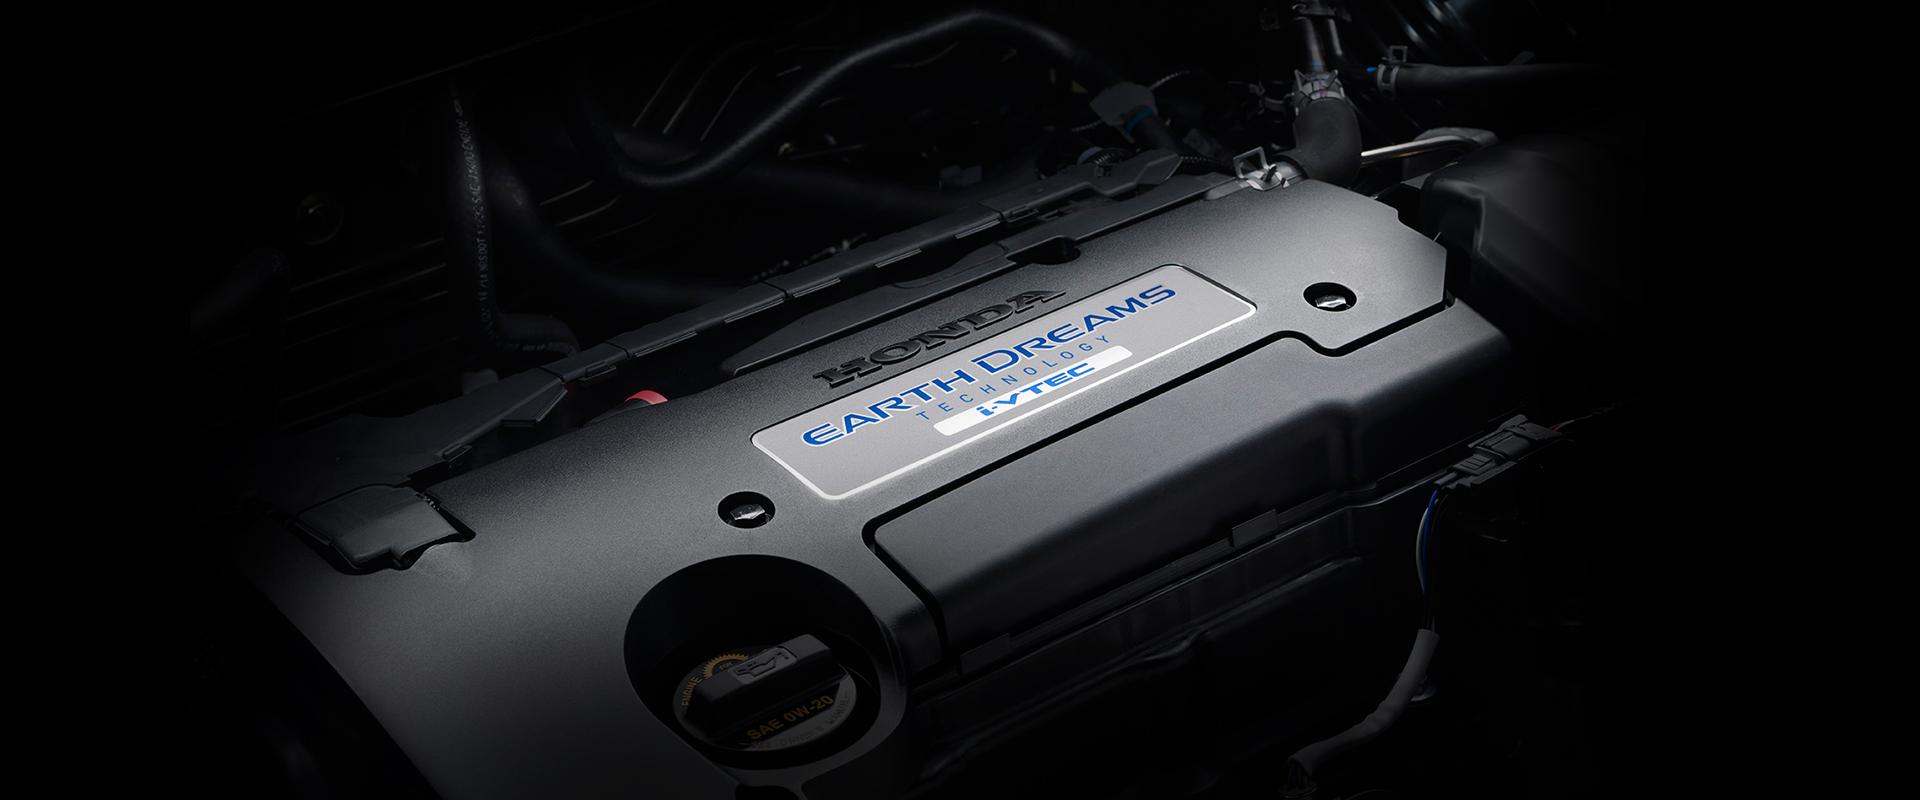 2016-hona-cr-v-engine